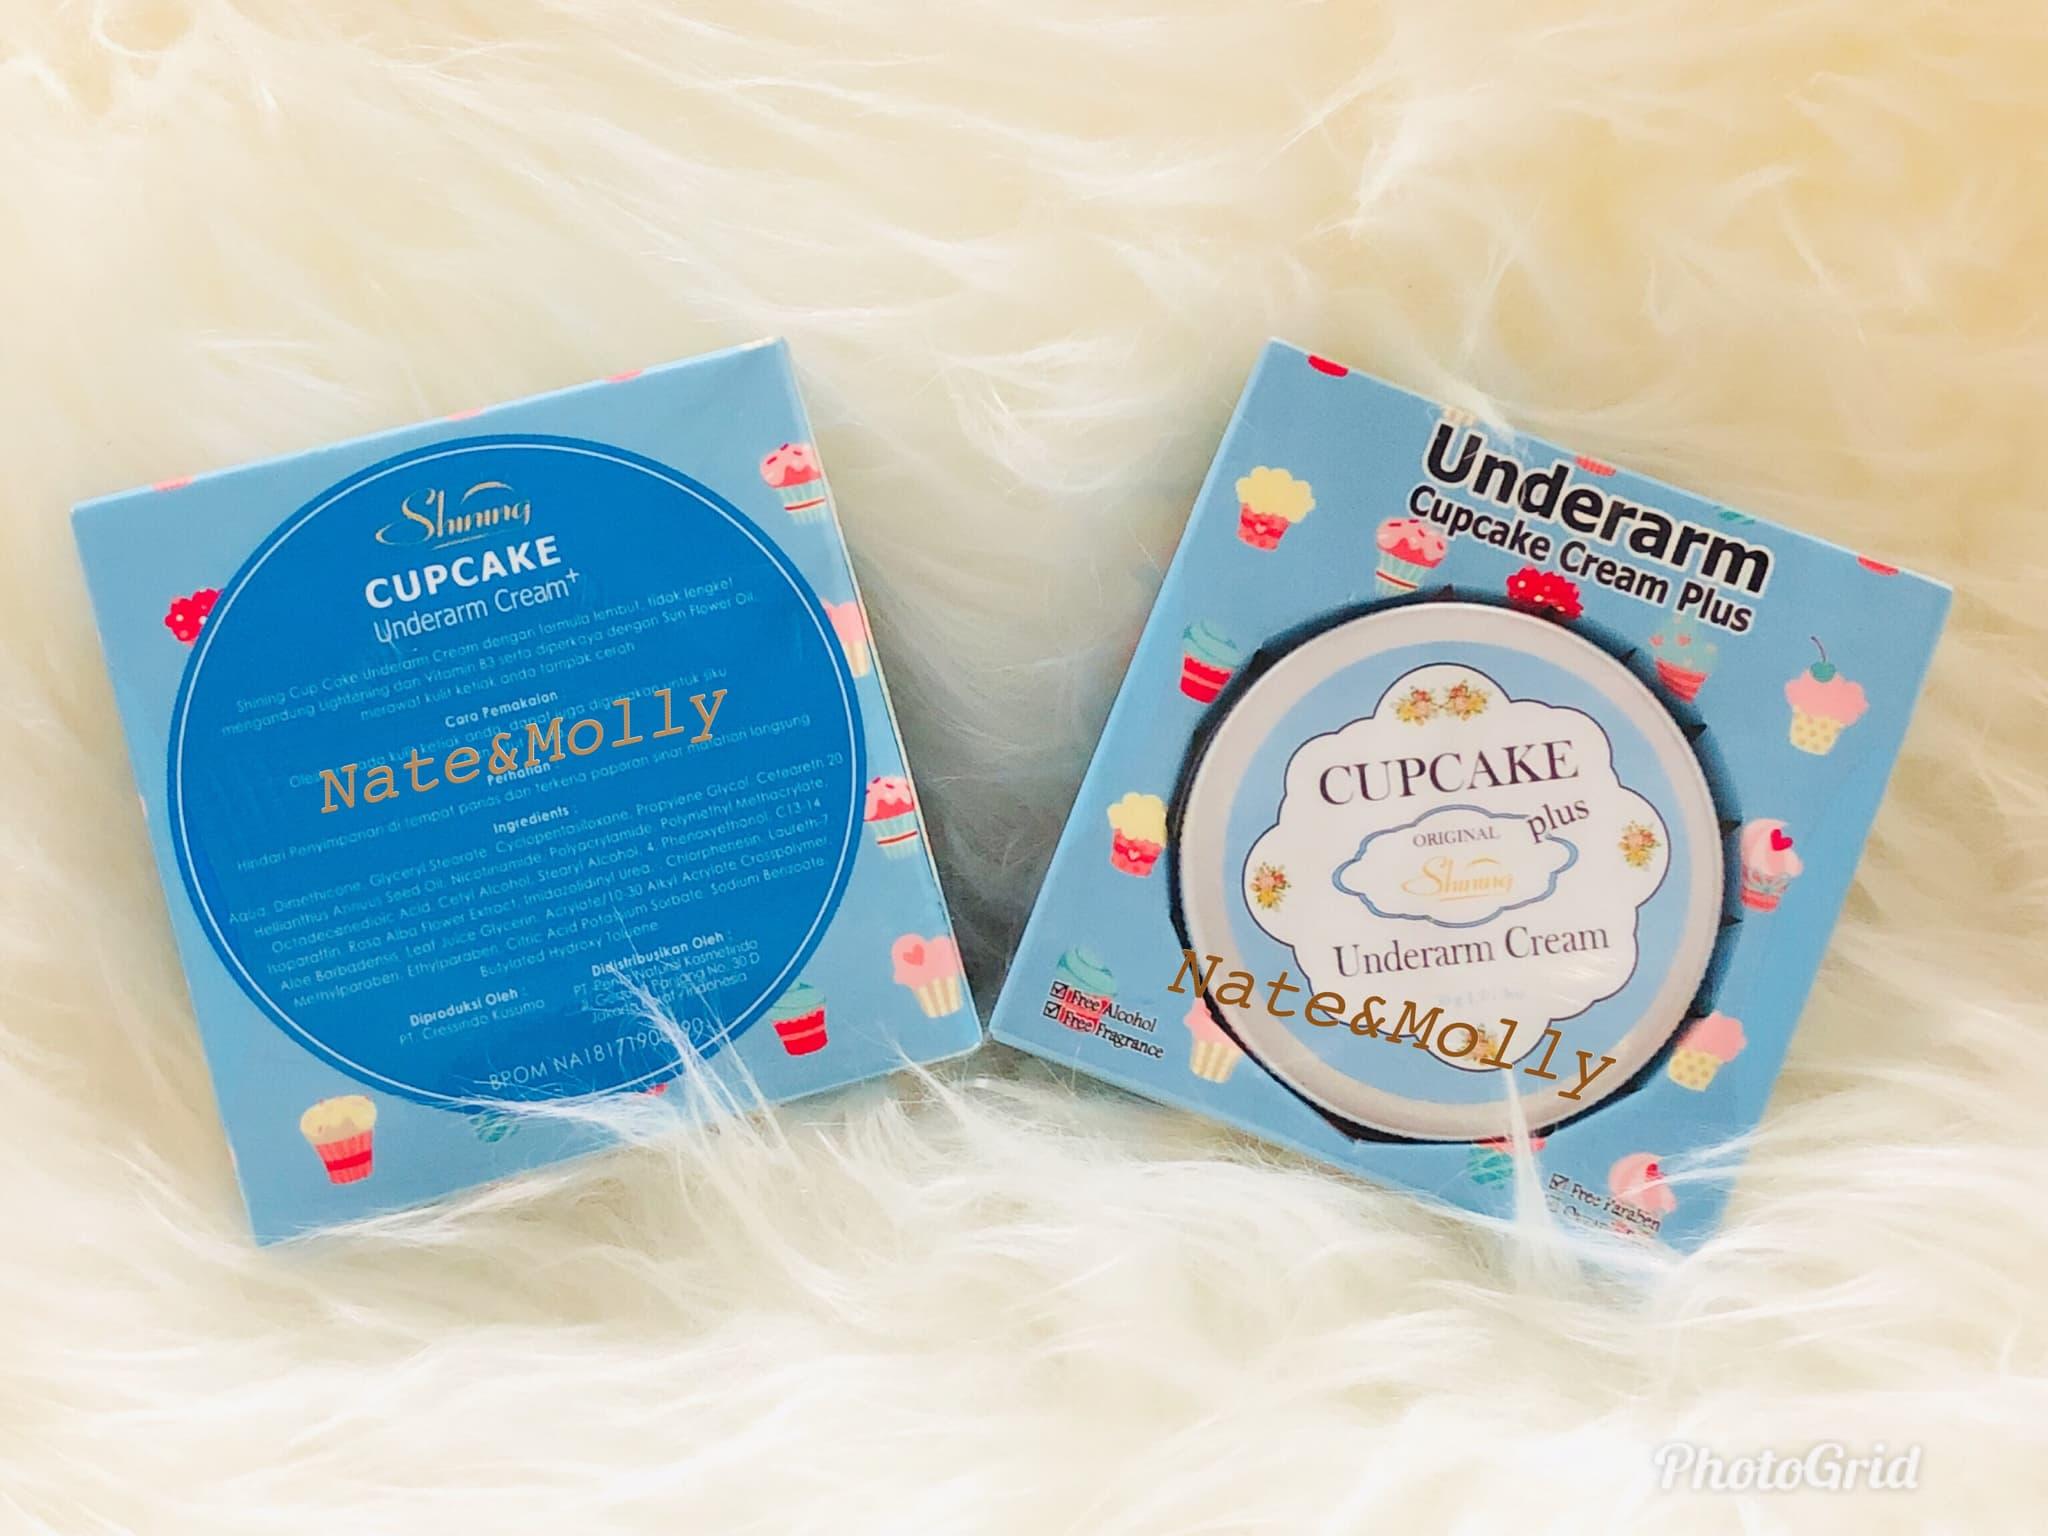 Jual Shining Cupcake Underarm Cream With Sun Flower Oil Cup Cake Plus Pemutih Ketiak Bpom Natemolly Tokopedia